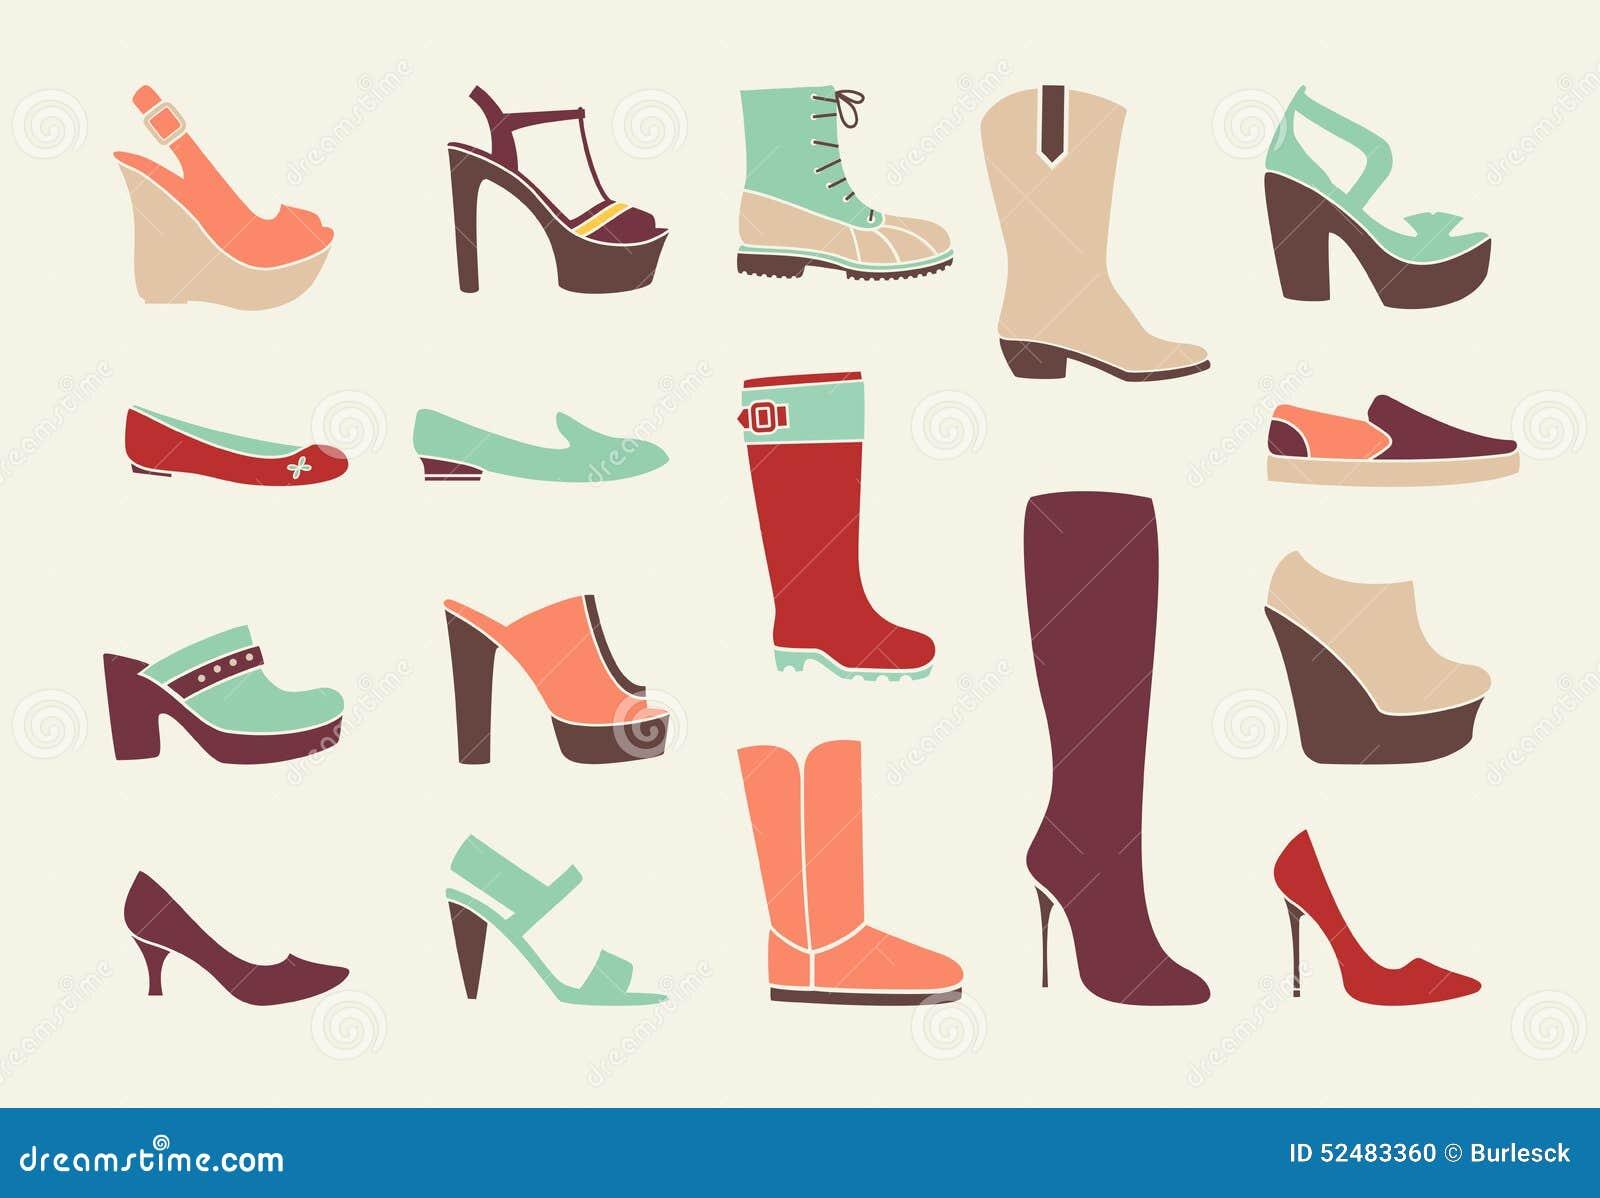 Original Fashion Illustrations Google Fashion Shoes Cowboys Shoe Illustration